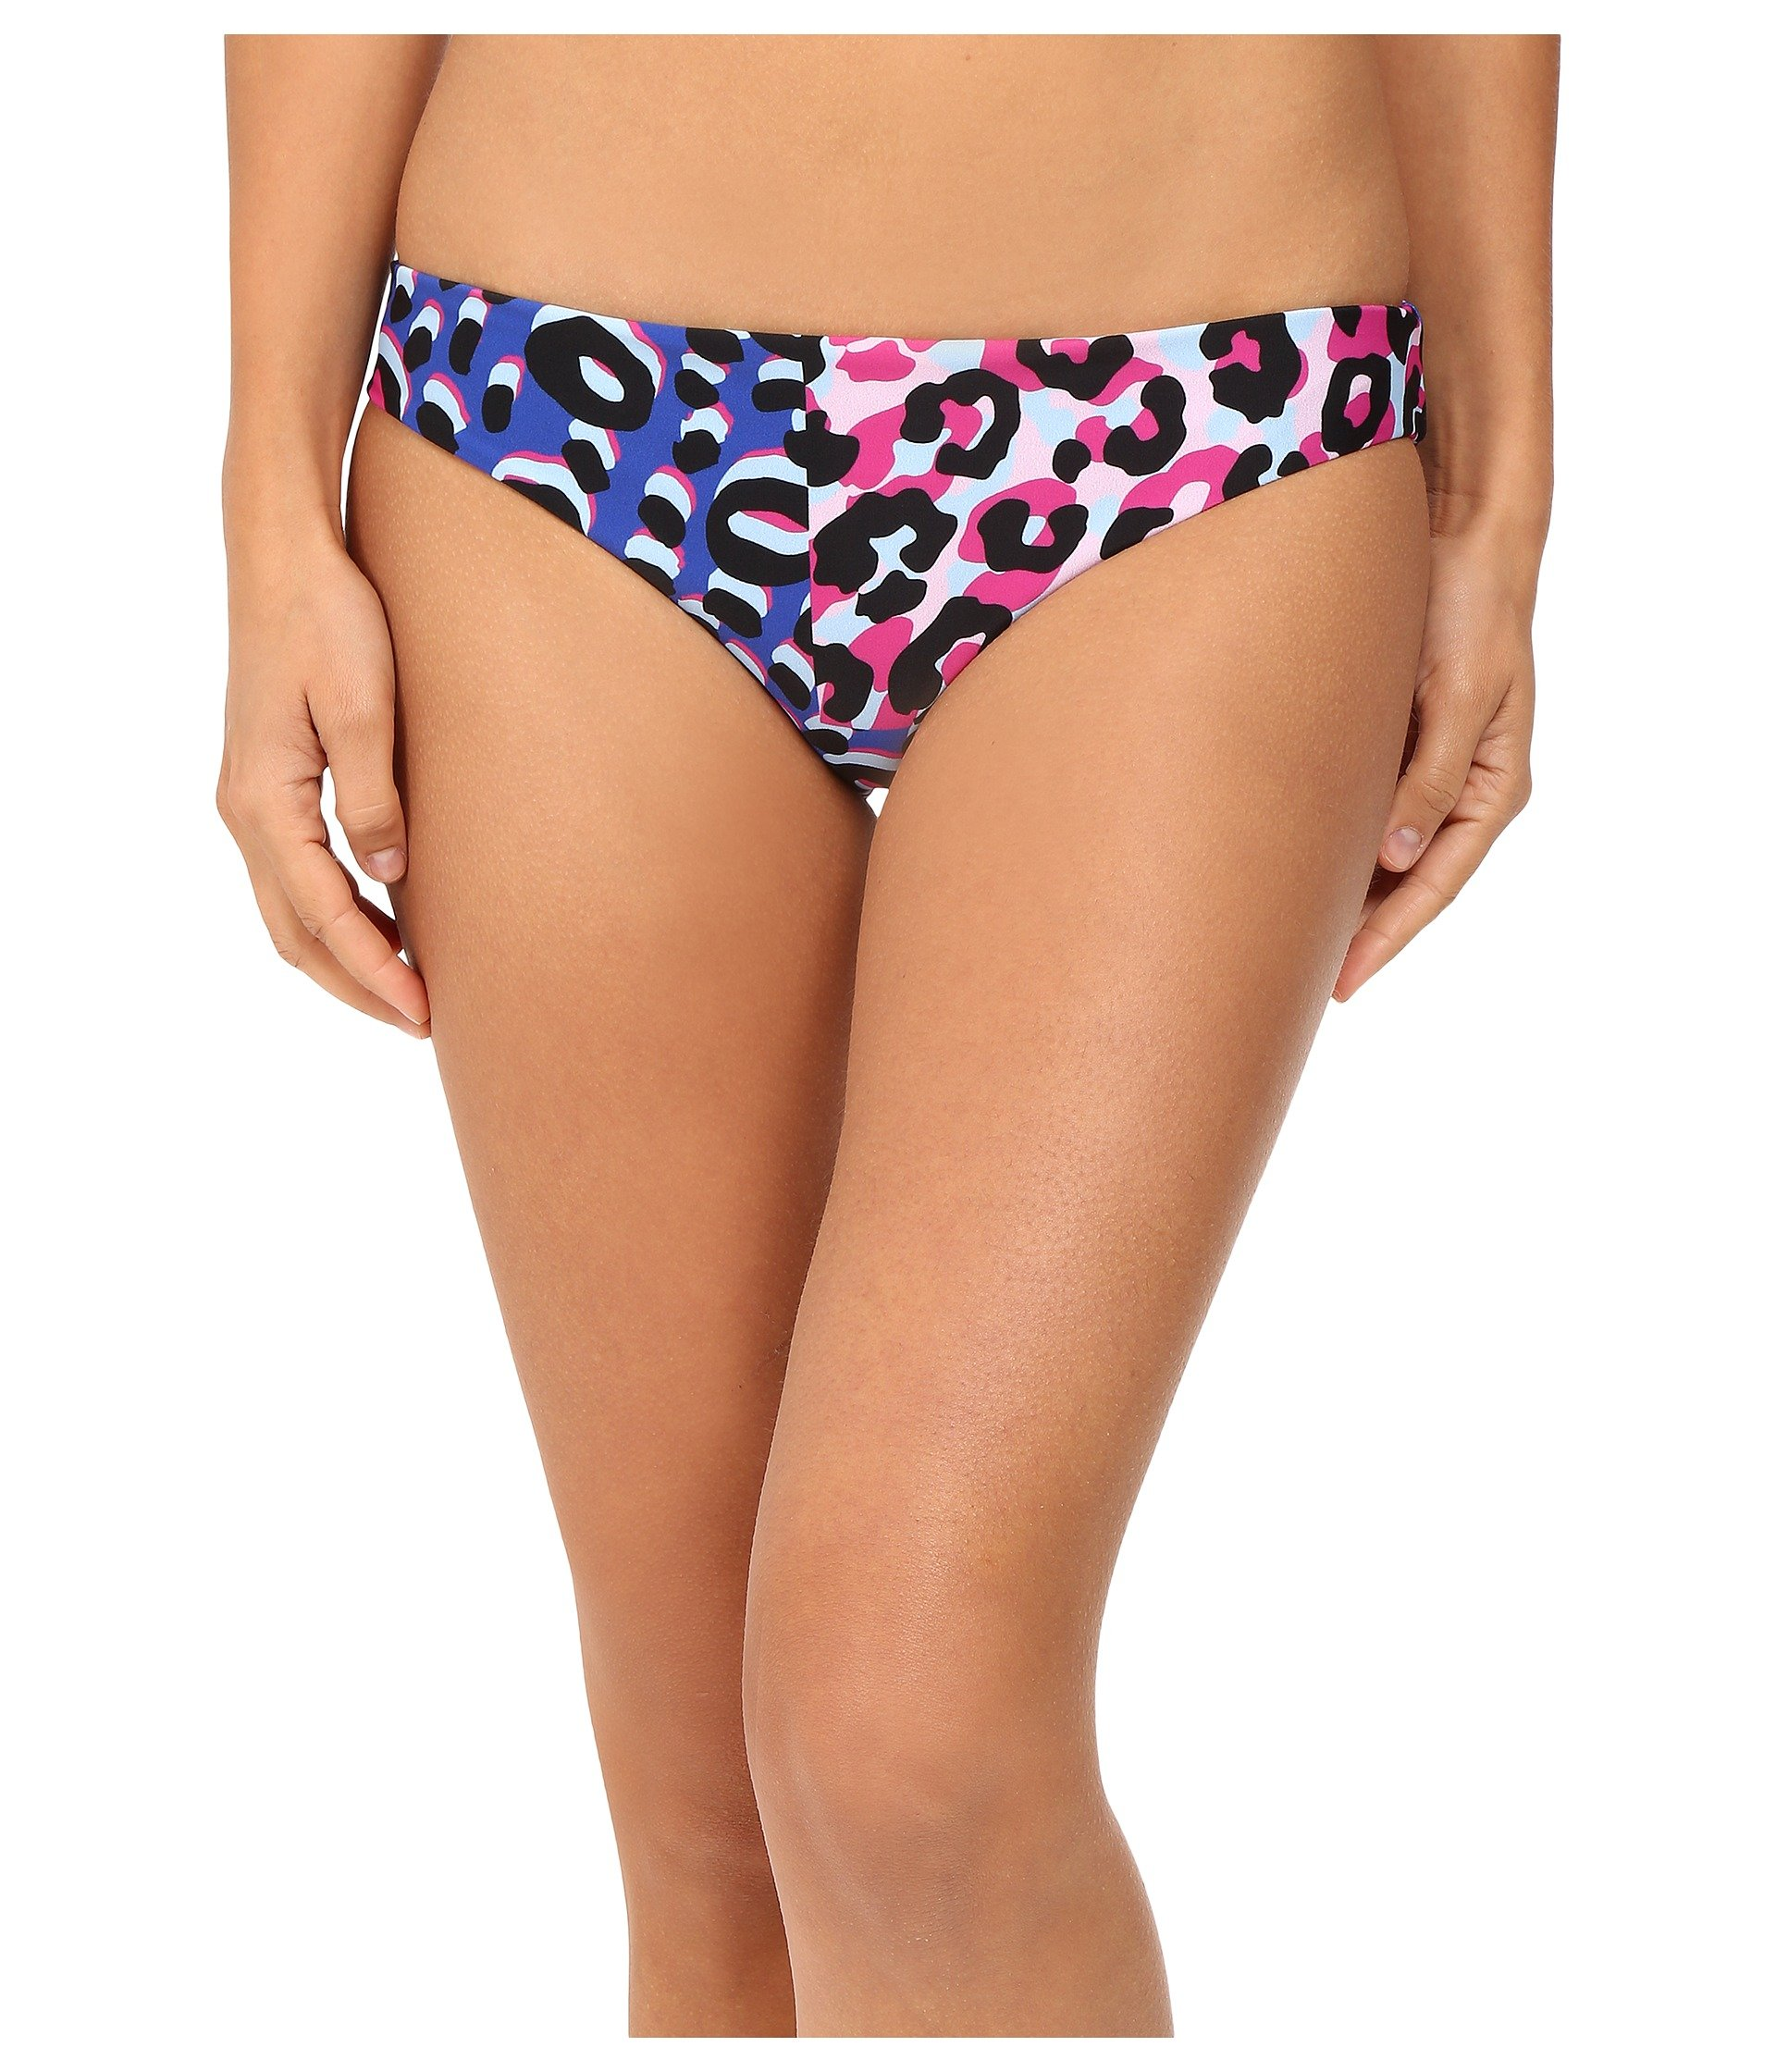 Bikini para Mujer Versace Animalier Bikini Bottom  + Versace en VeoyCompro.net